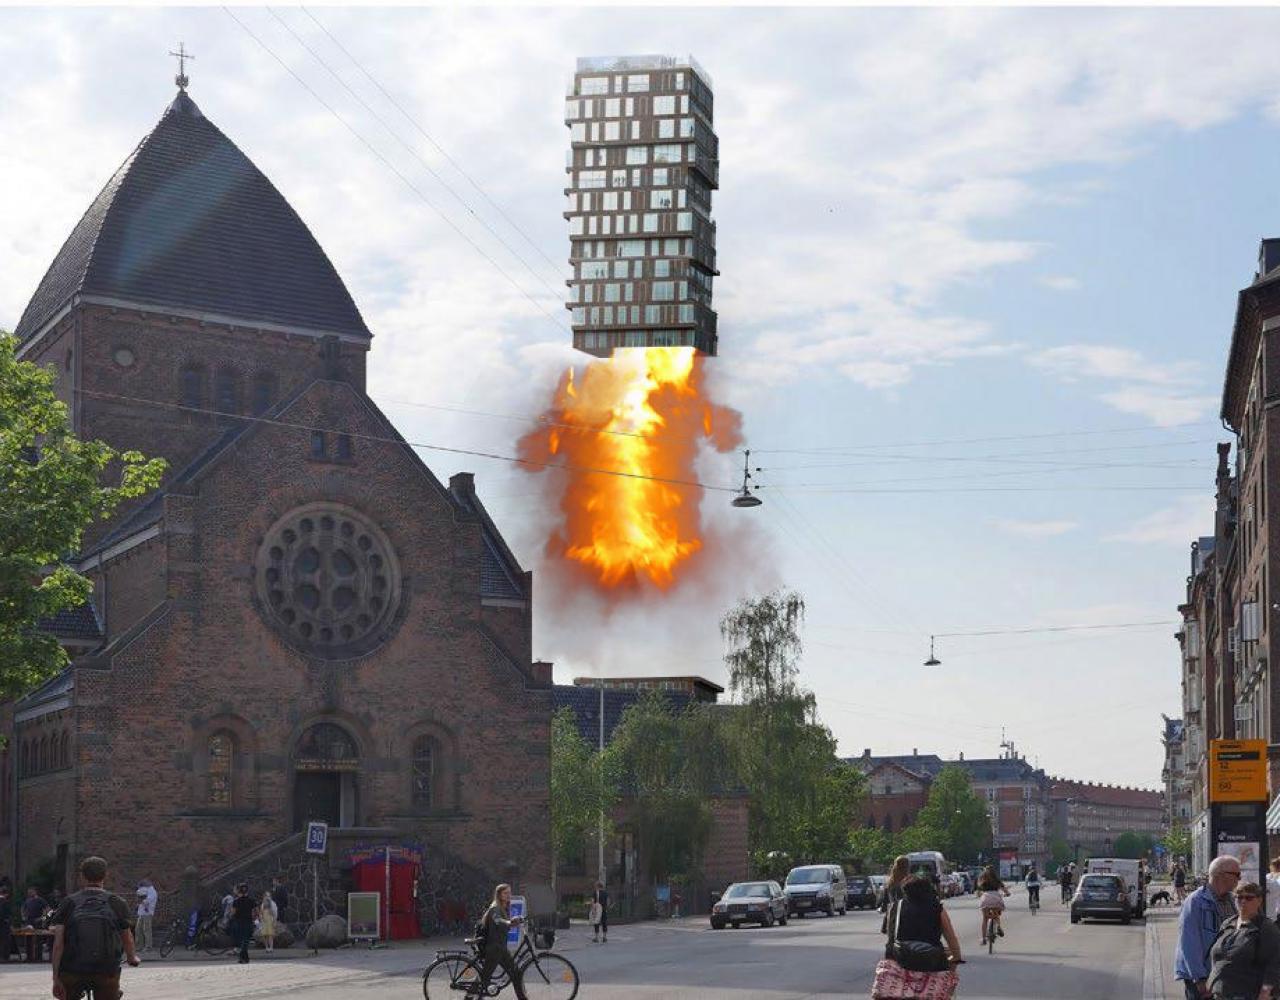 Nuuks Plads 24 meter raket